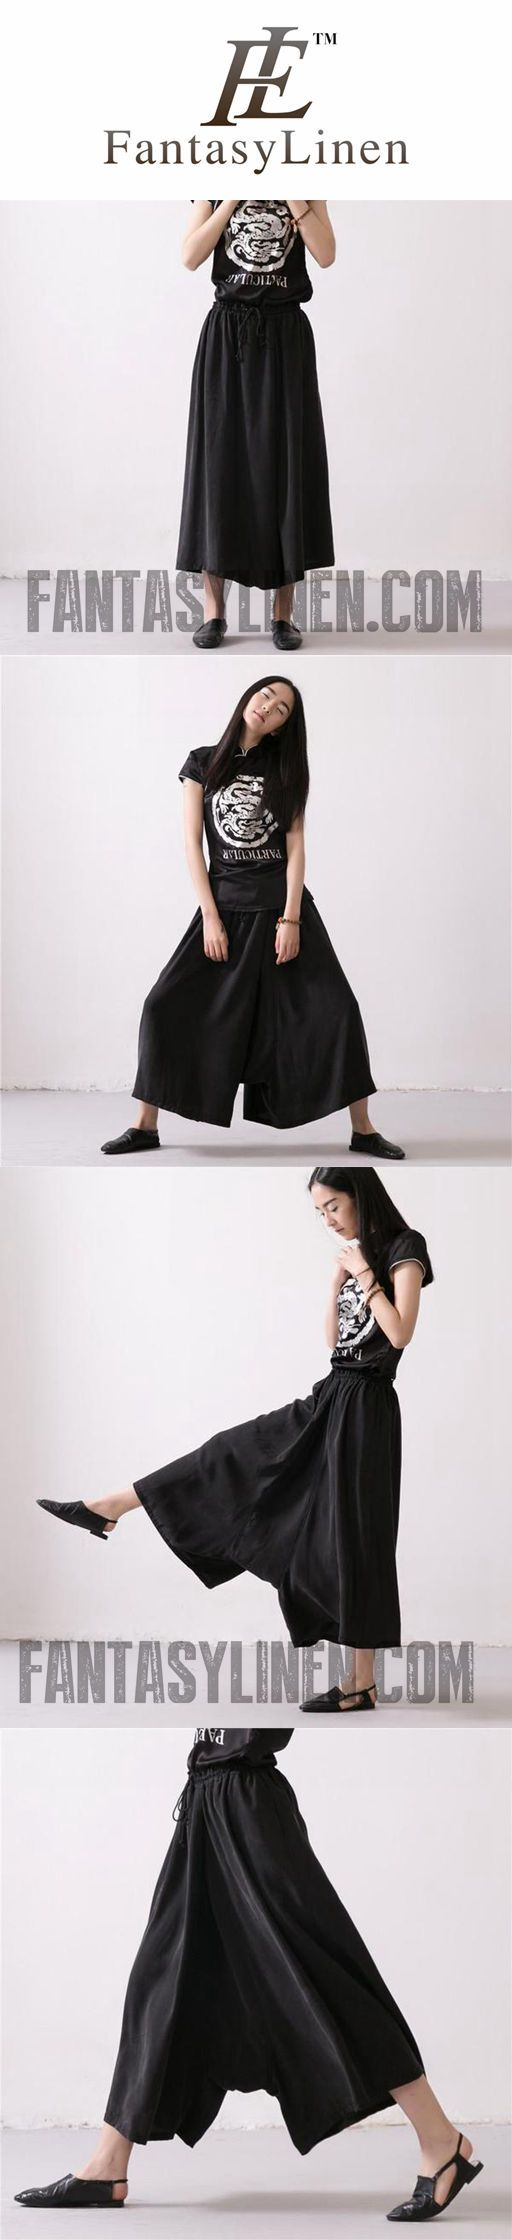 LINEN TROUSERS BLACK WOMEN DRESS SLACKS PANTS K037